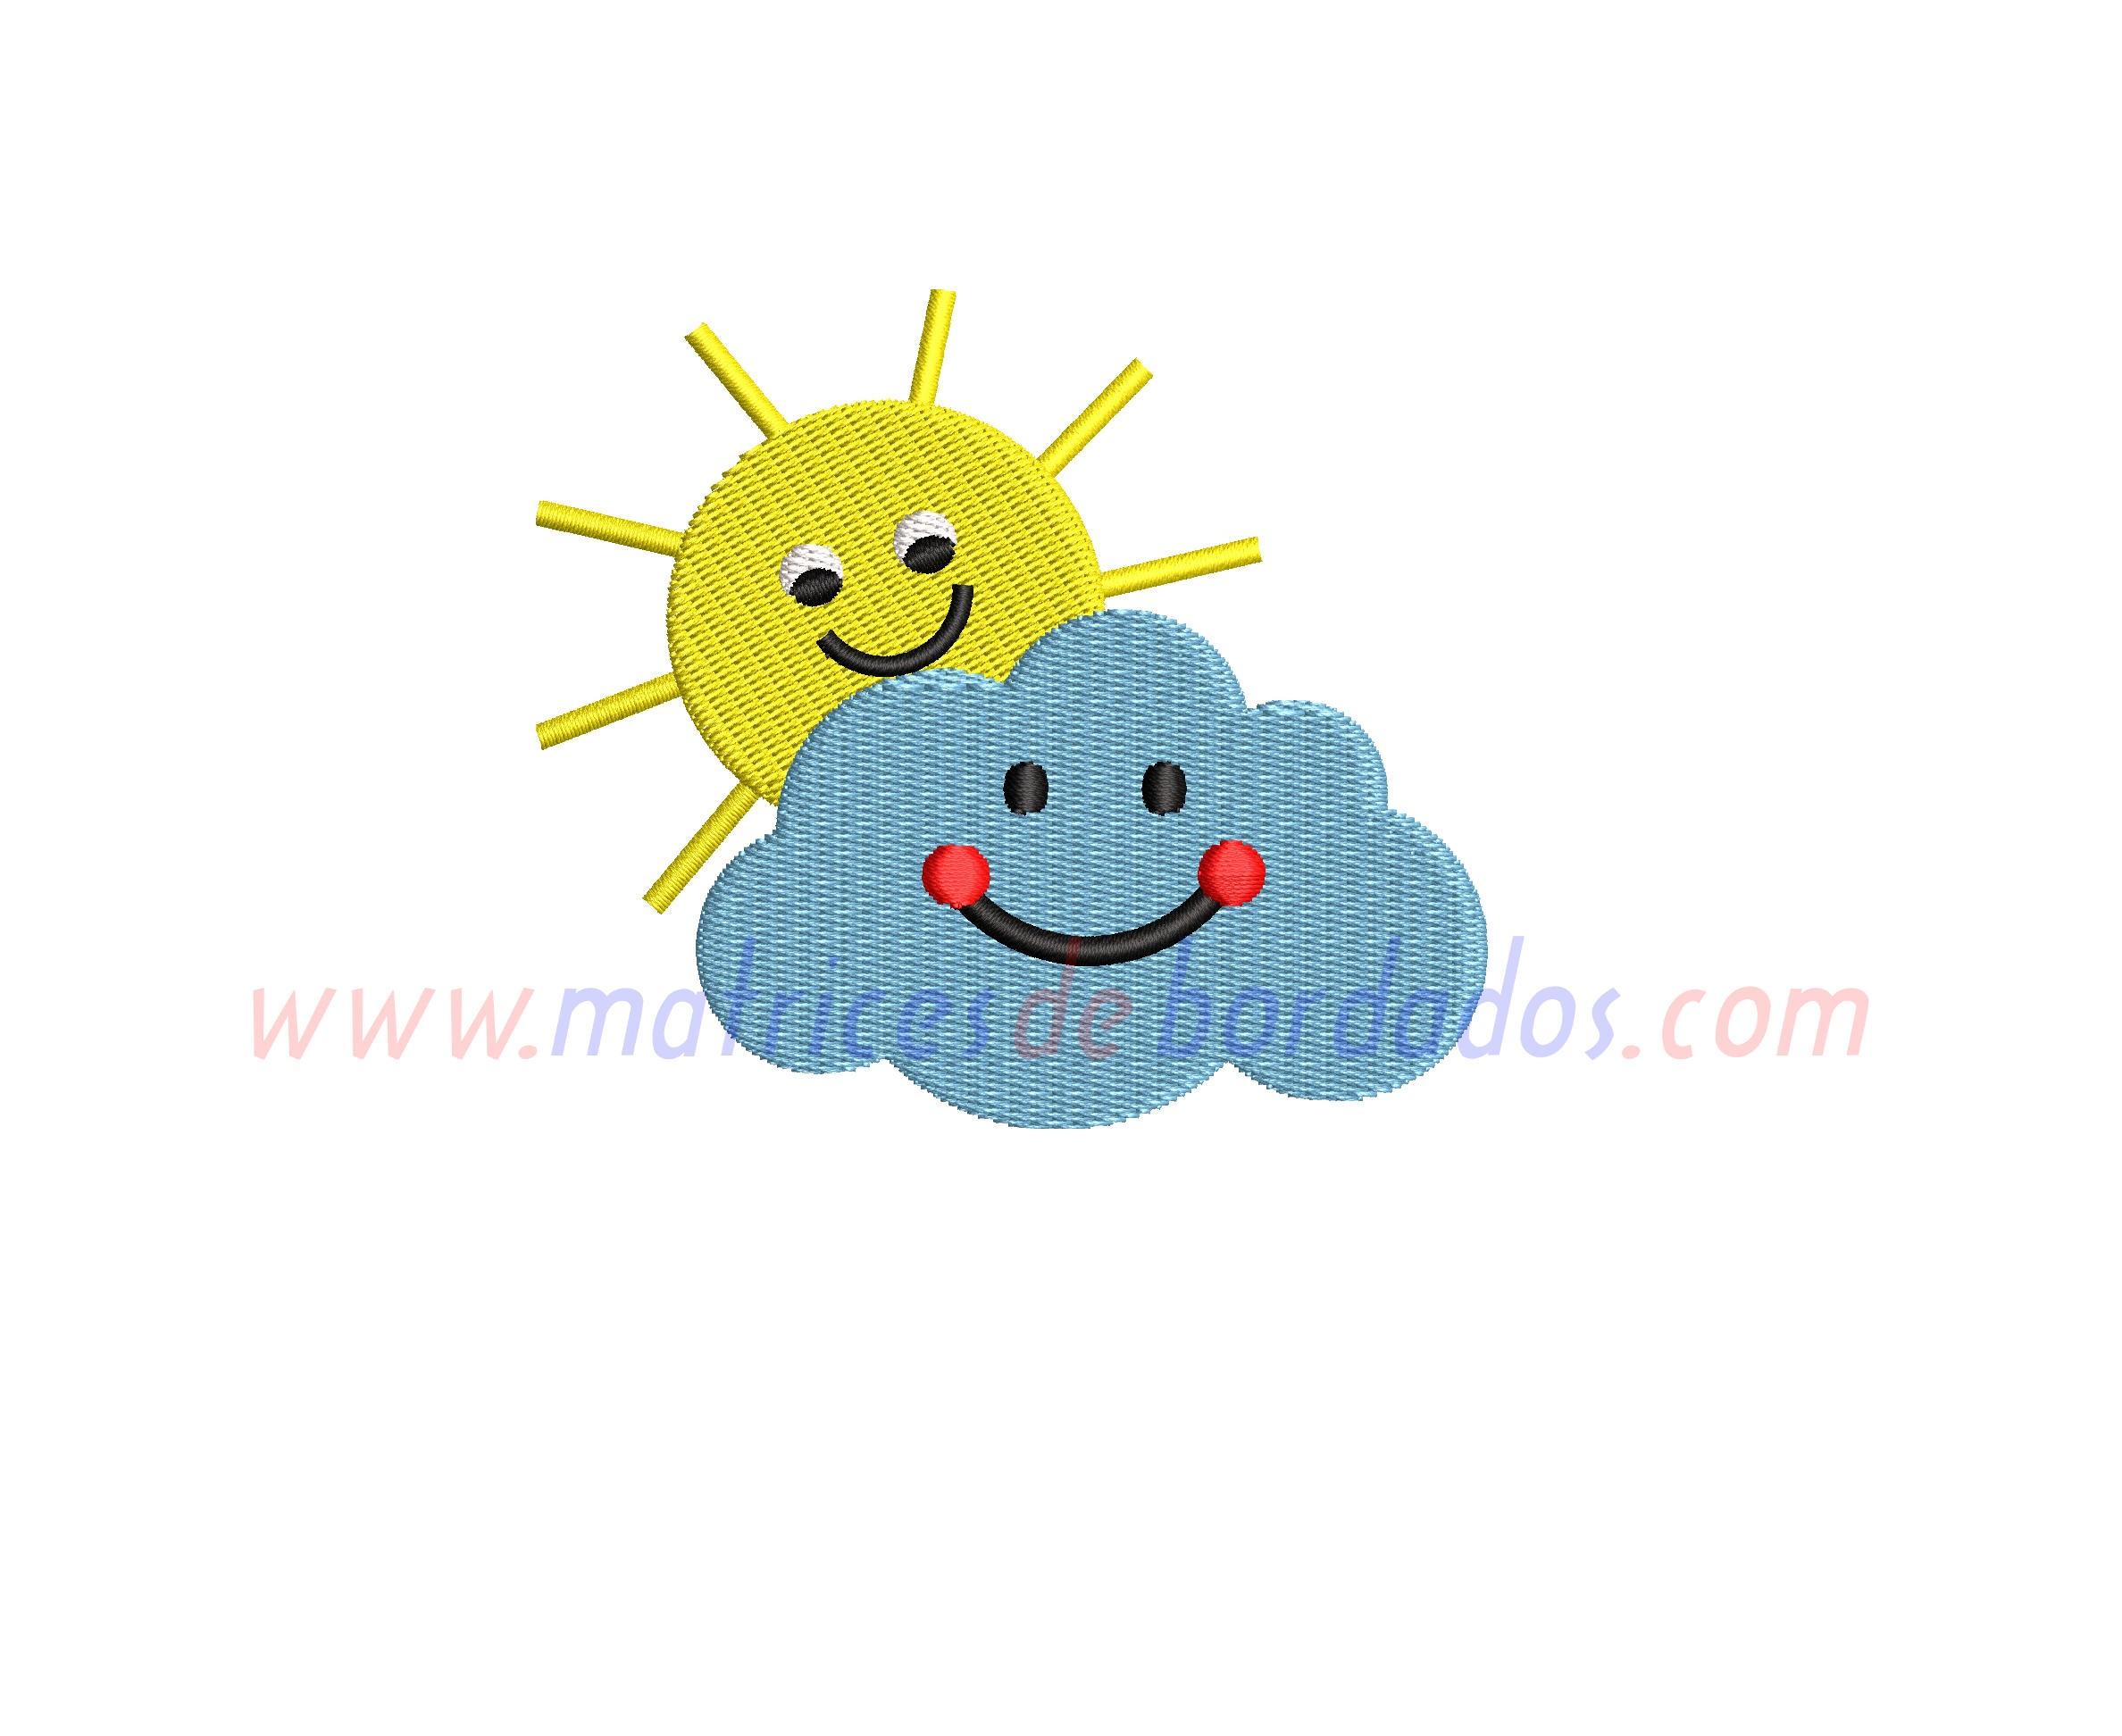 LL51MY - Sol y Nube